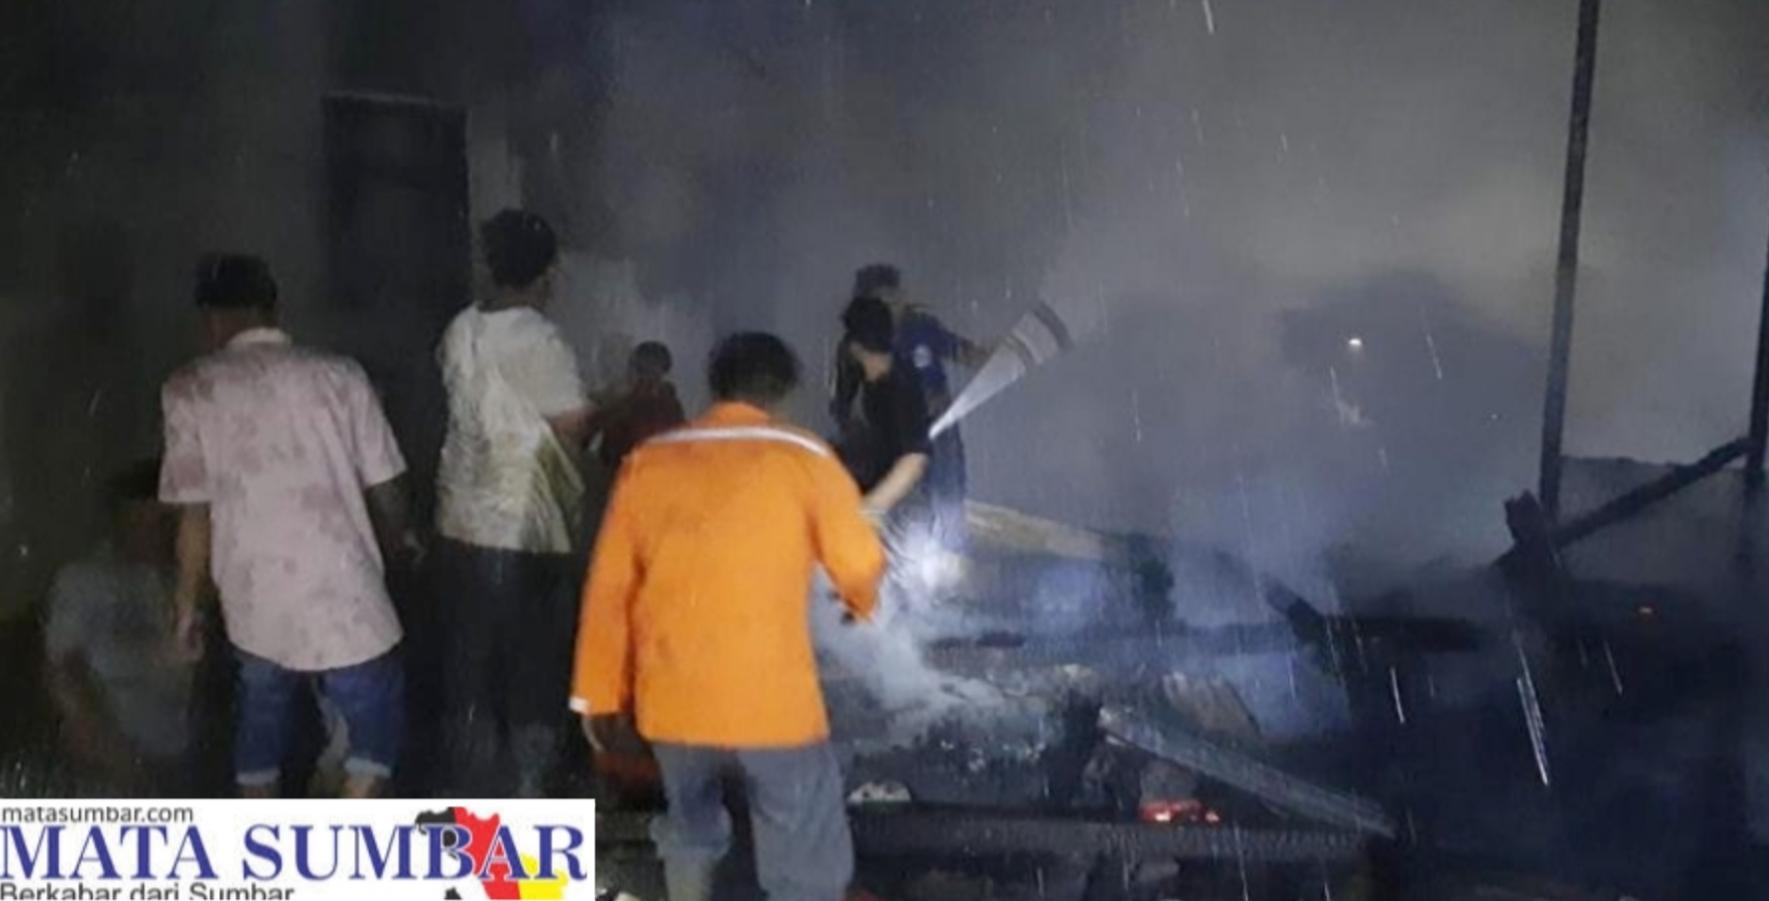 Ditinggal Saat Sholat Tarawih, 3 Unit Rumah Ludes Terbakar di Pasbar